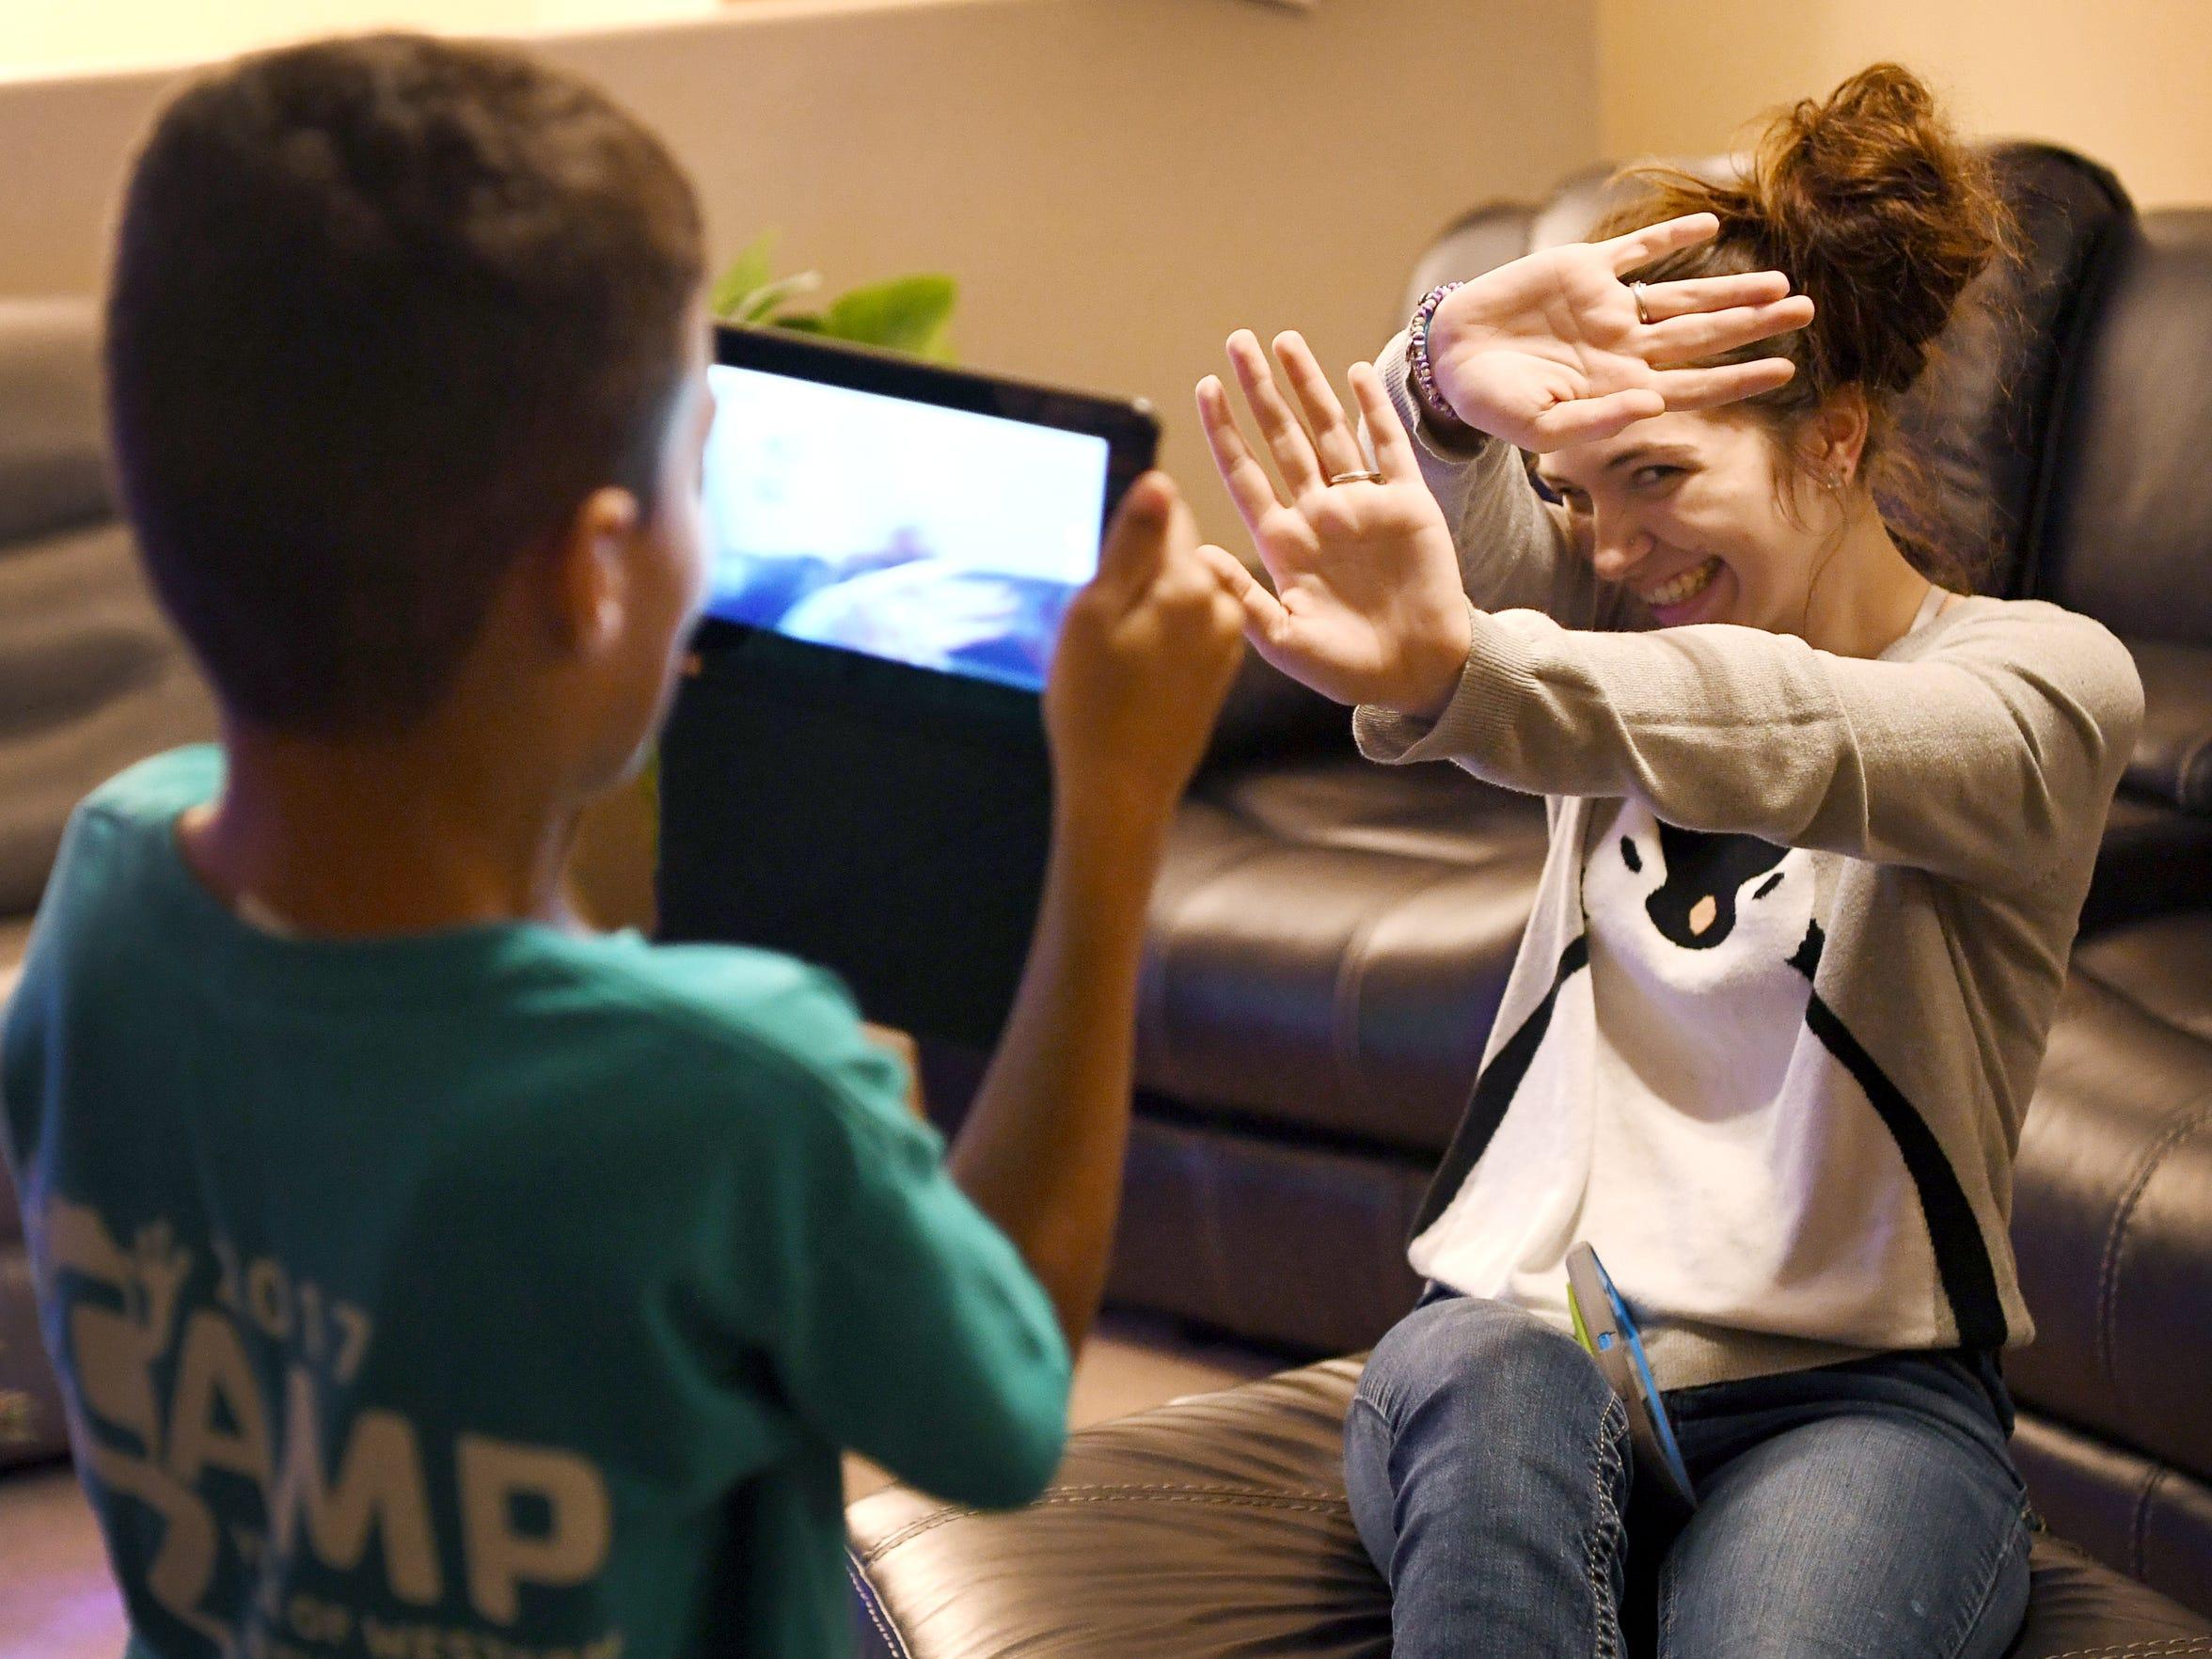 Megan Wyatt, 17, laughs as she blocks Emanie, her foster